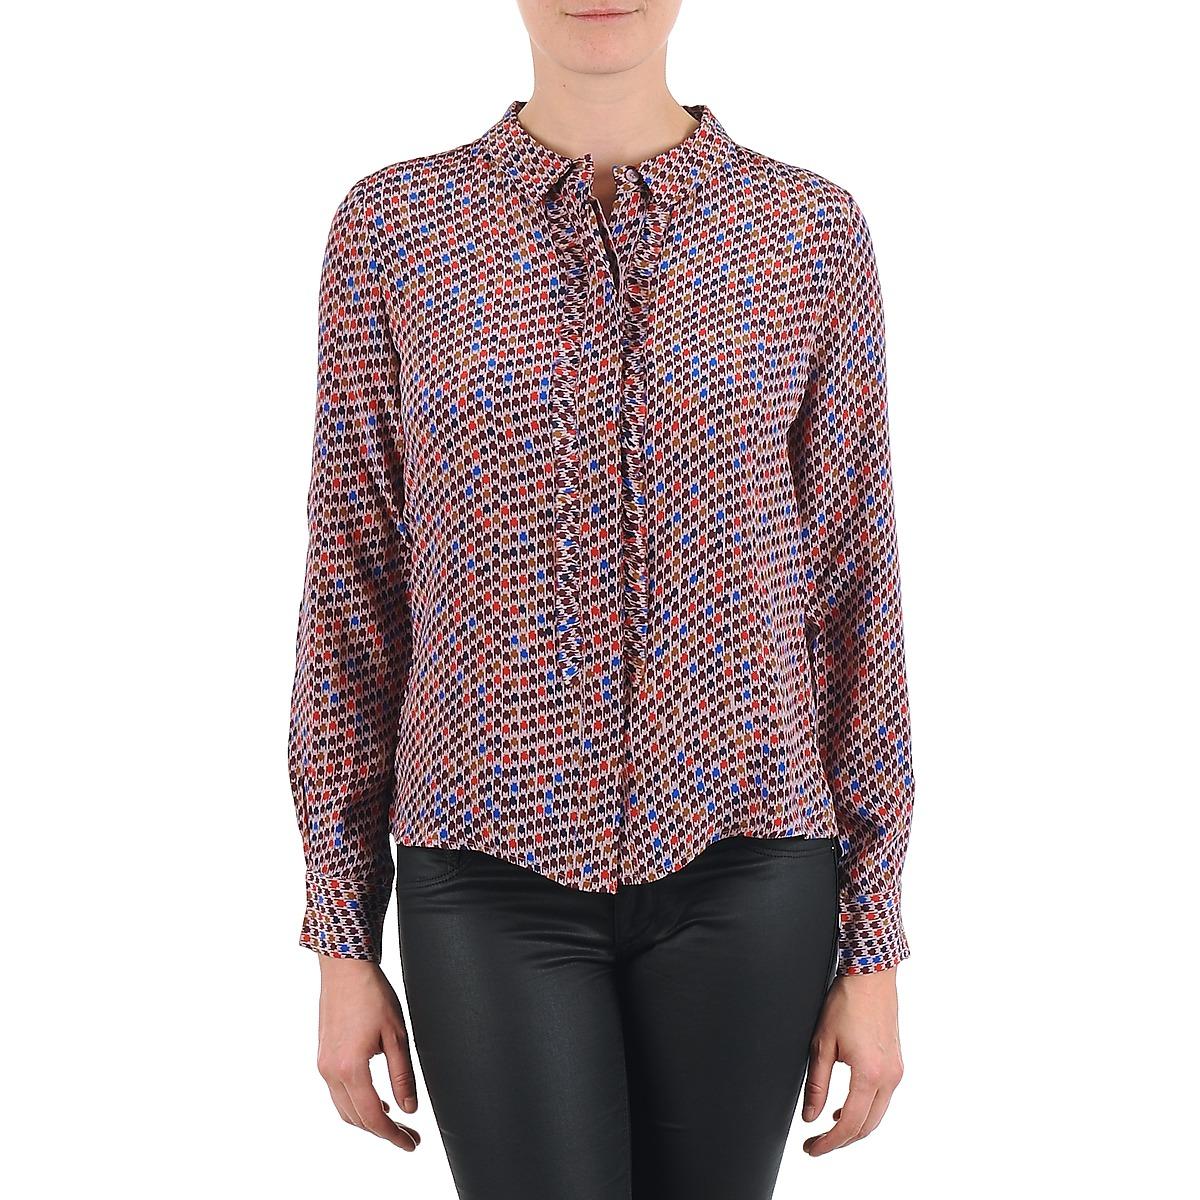 Kosile / Halenky Antik Batik DONAHUE